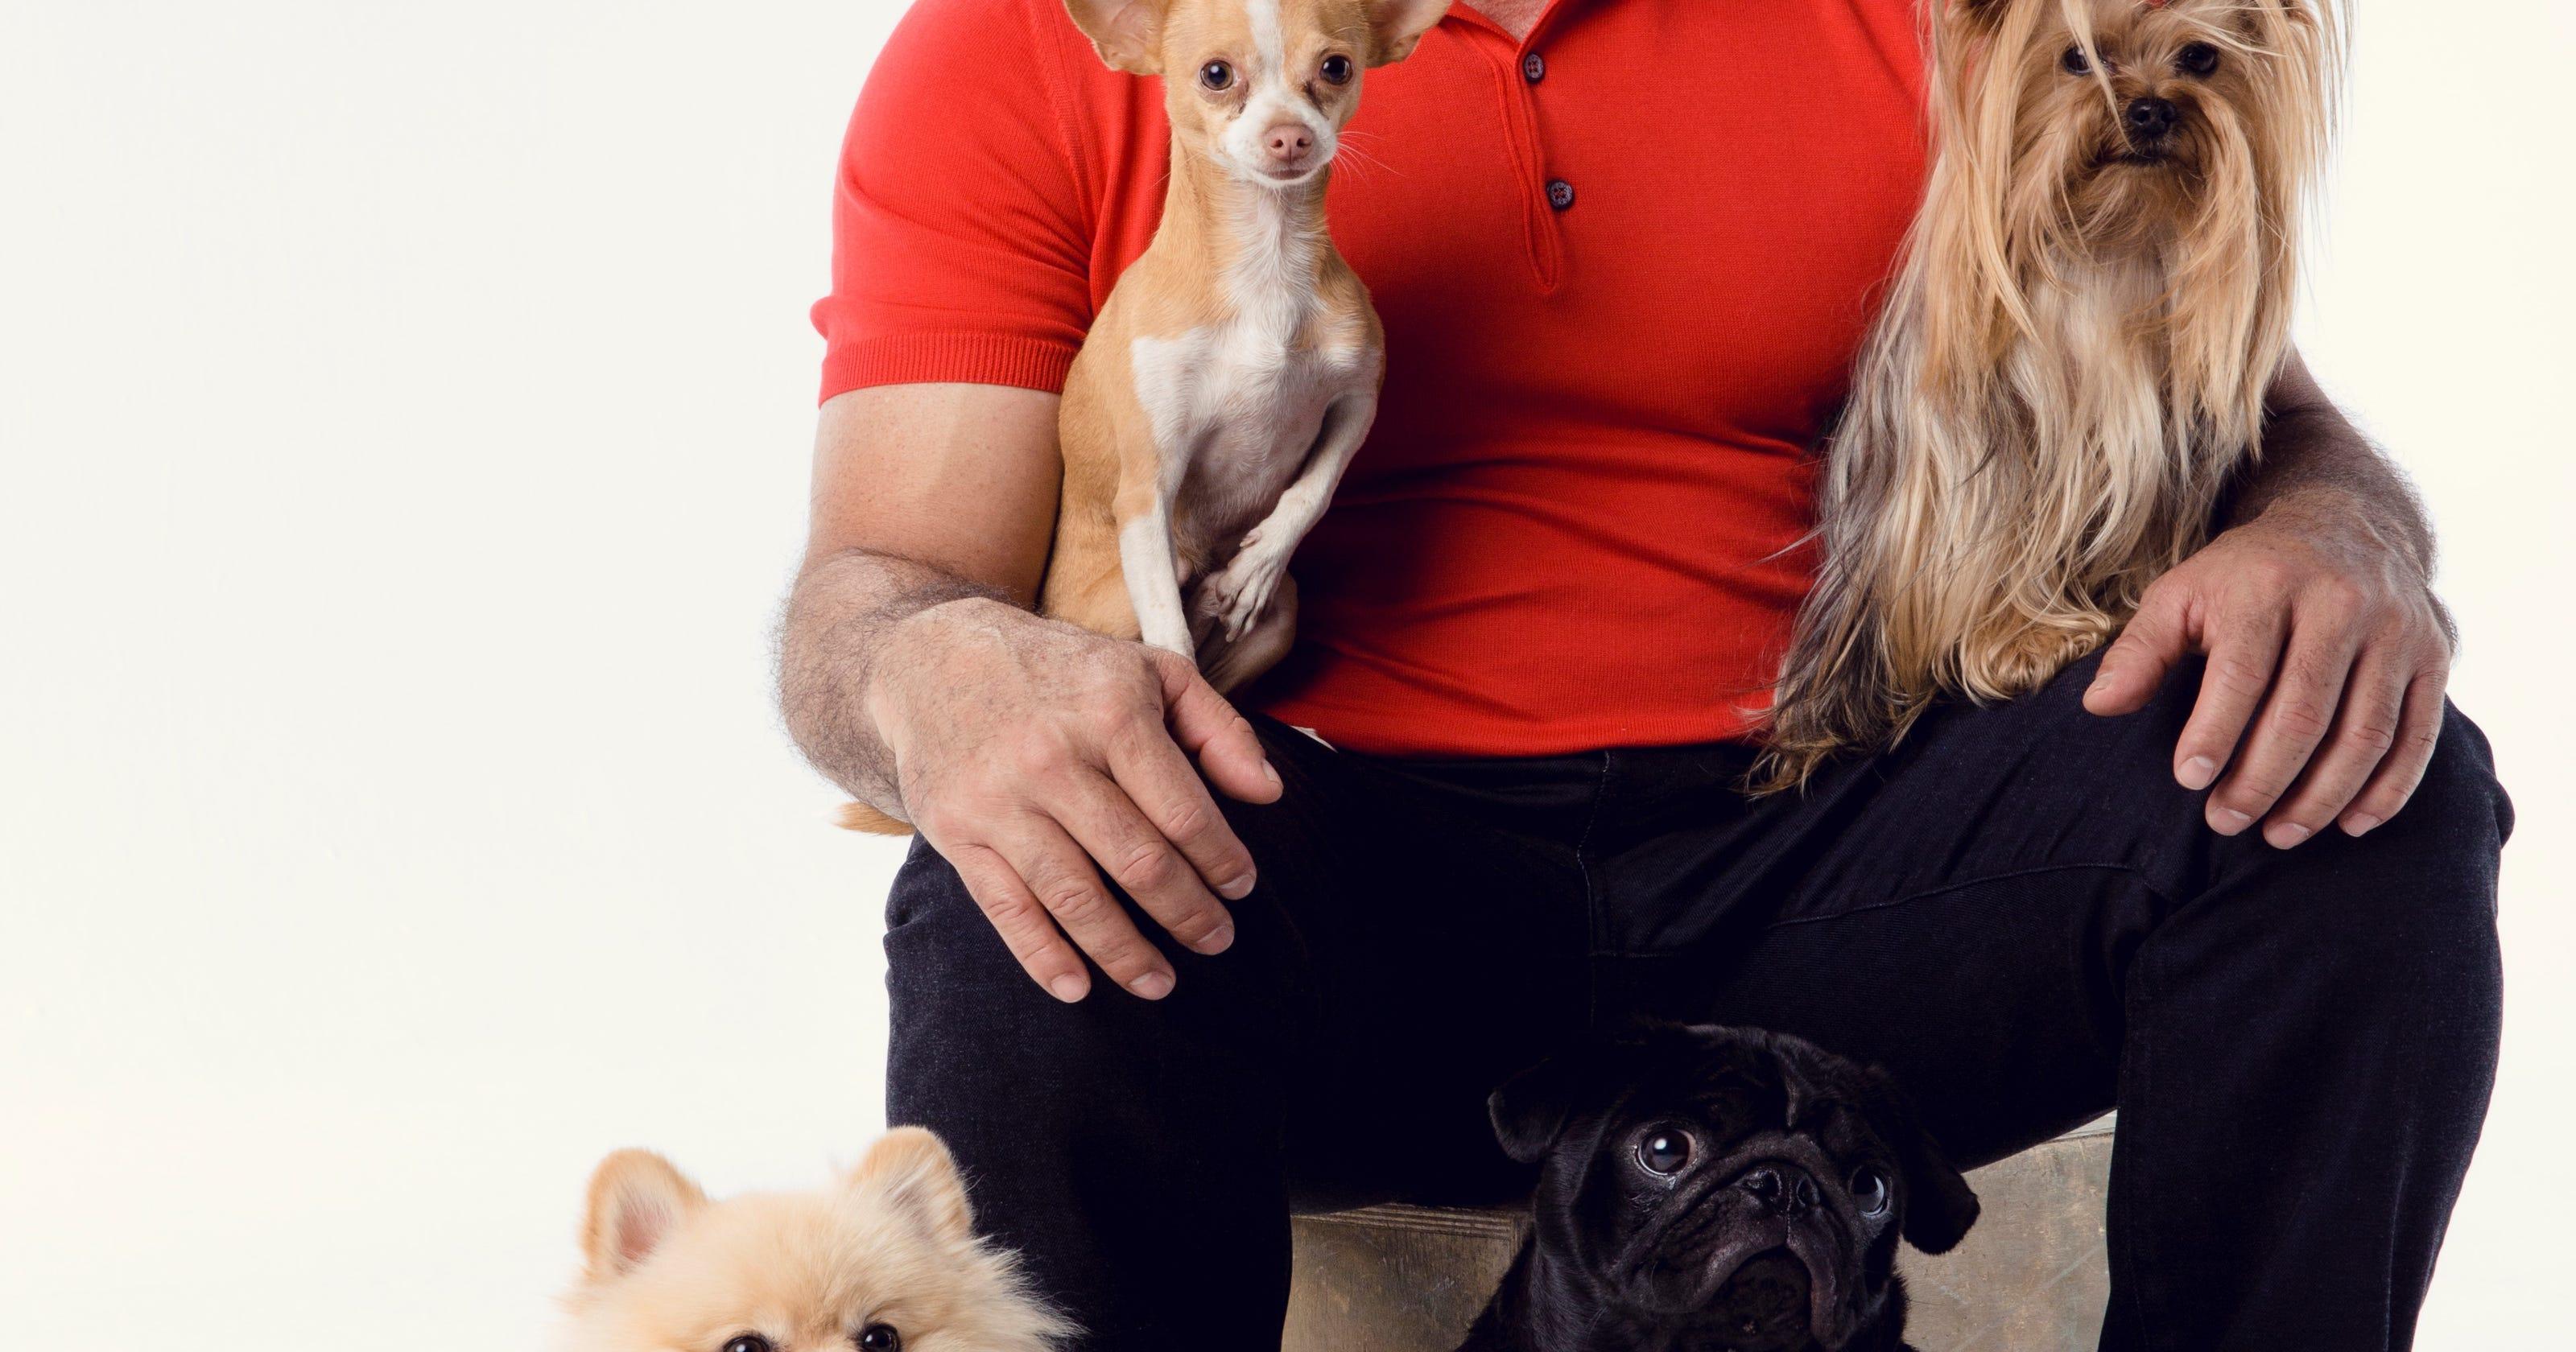 Dog Whisperer Cesar Millan Being Vulnerable Is A Big Step